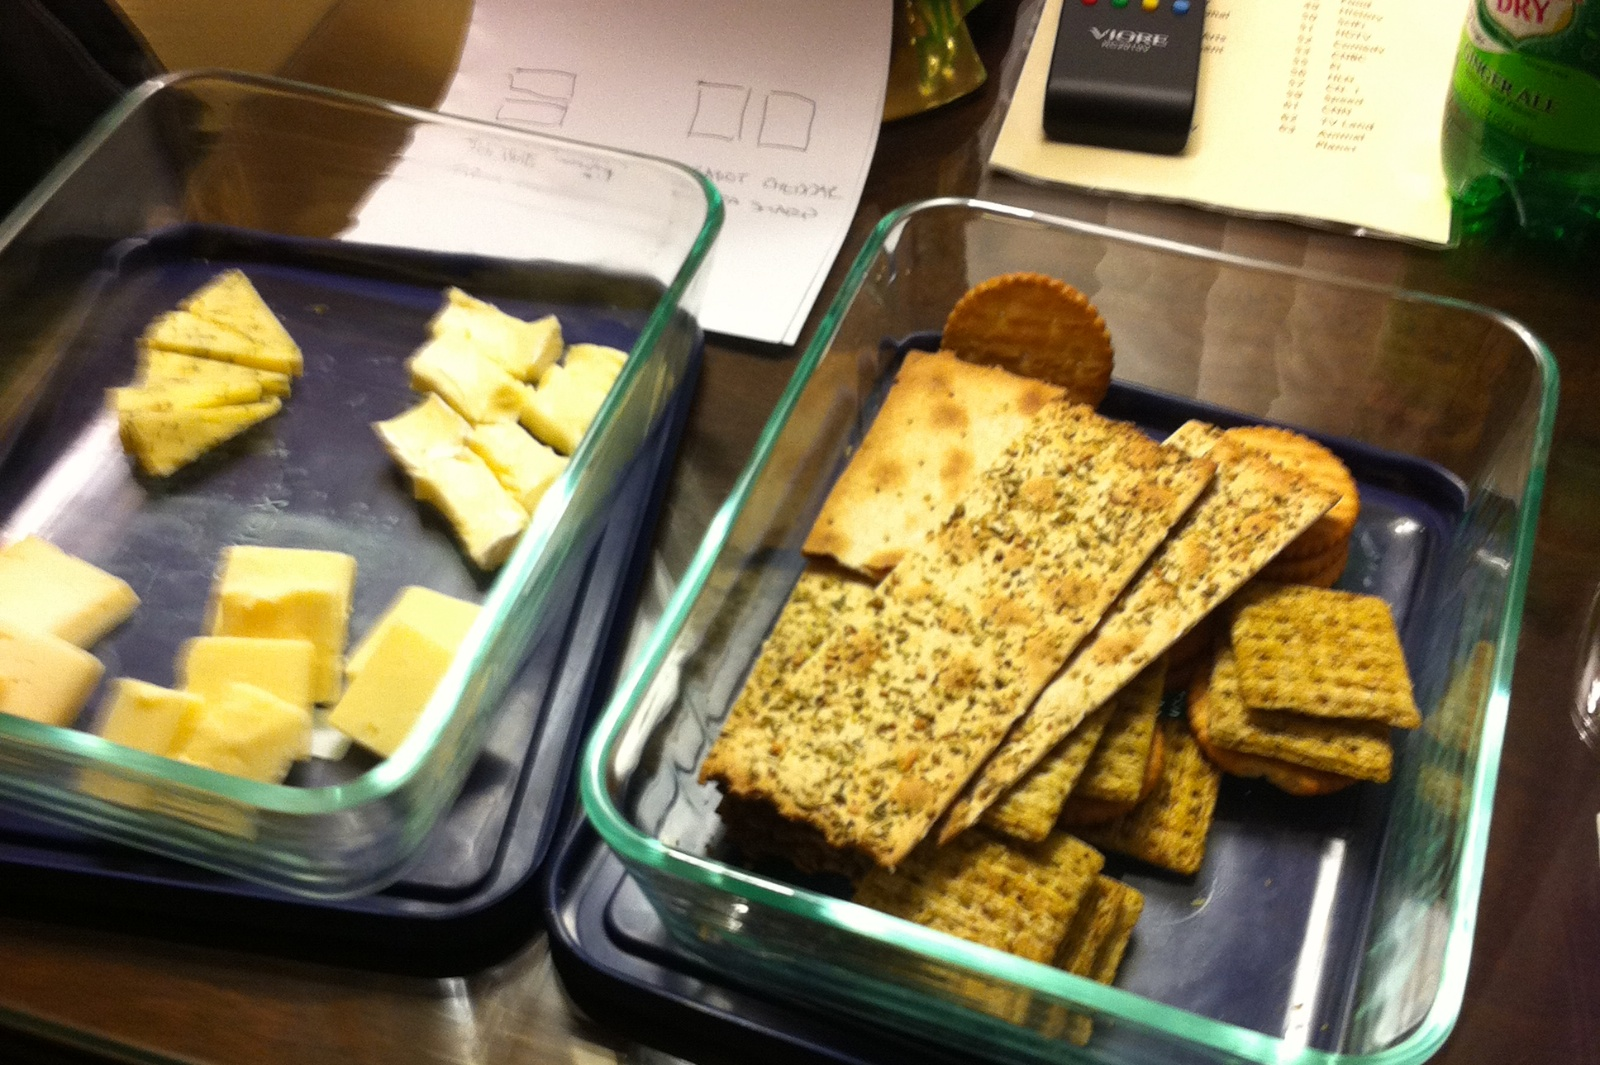 http://blog.rickk.com/food/2011/02/19/ate.2011.02.19.s.jpg